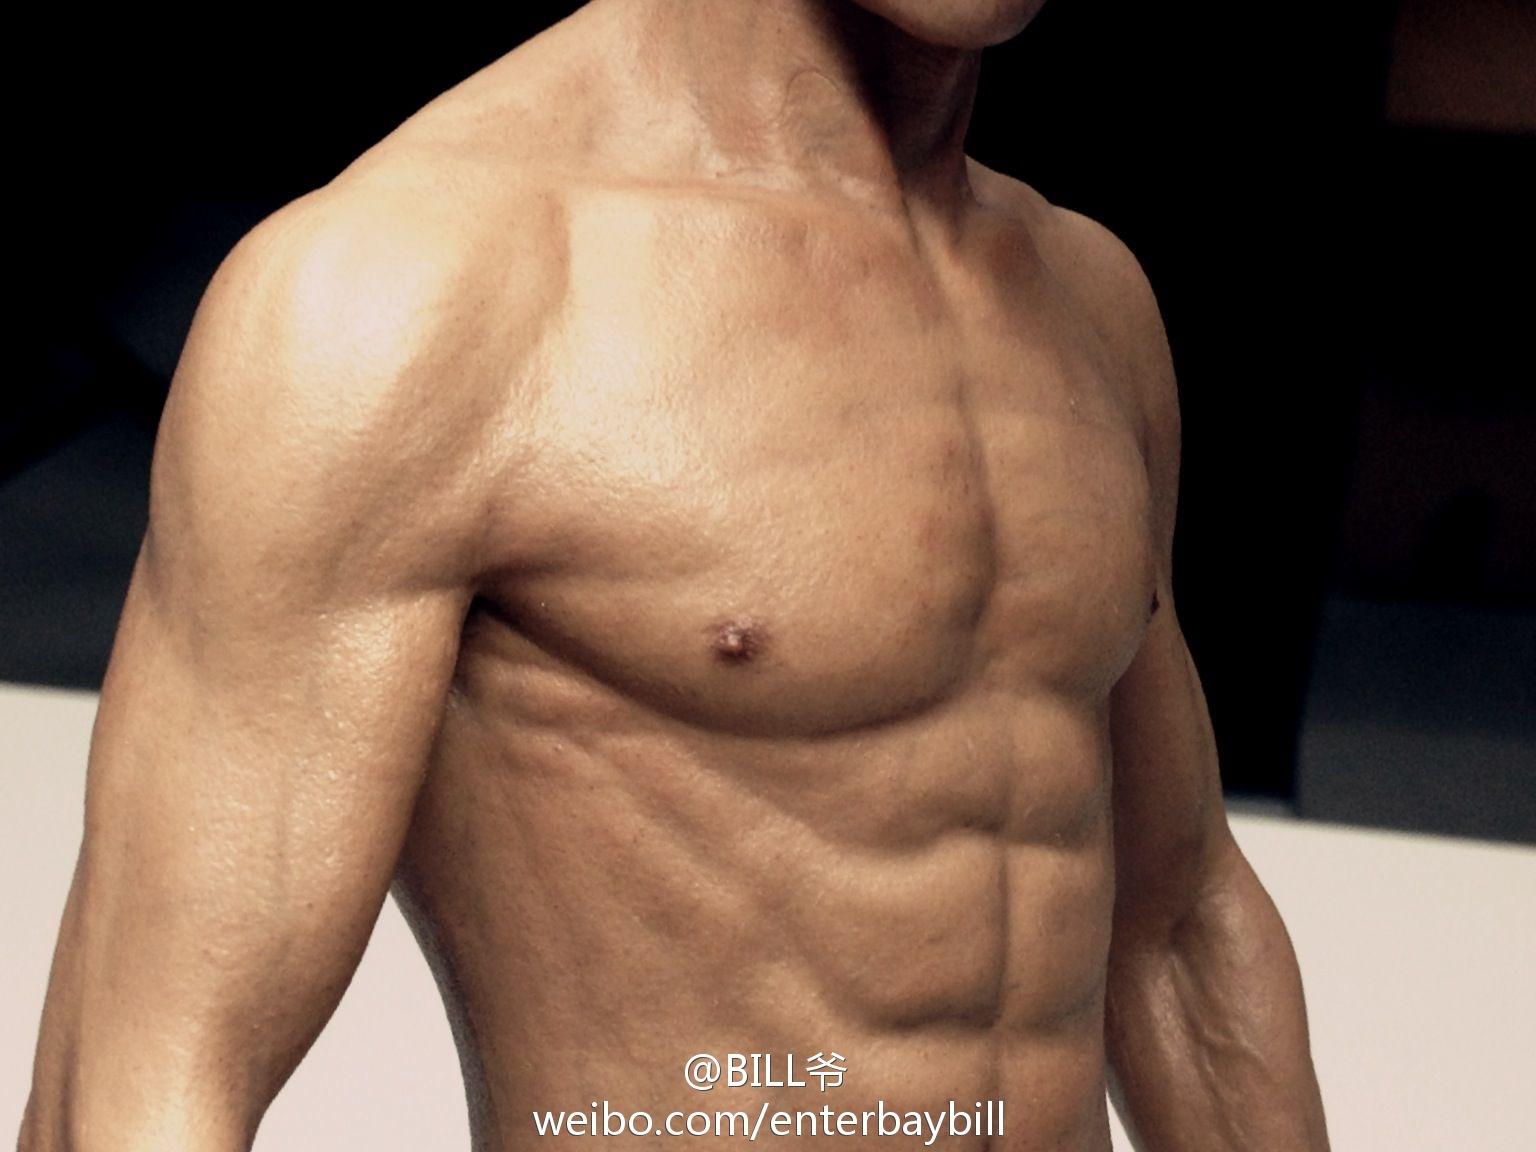 [Enterbay] Black Label - Bruce Lee - 1/6 Premium Statue 69464edejw1dtpy69m6hcj